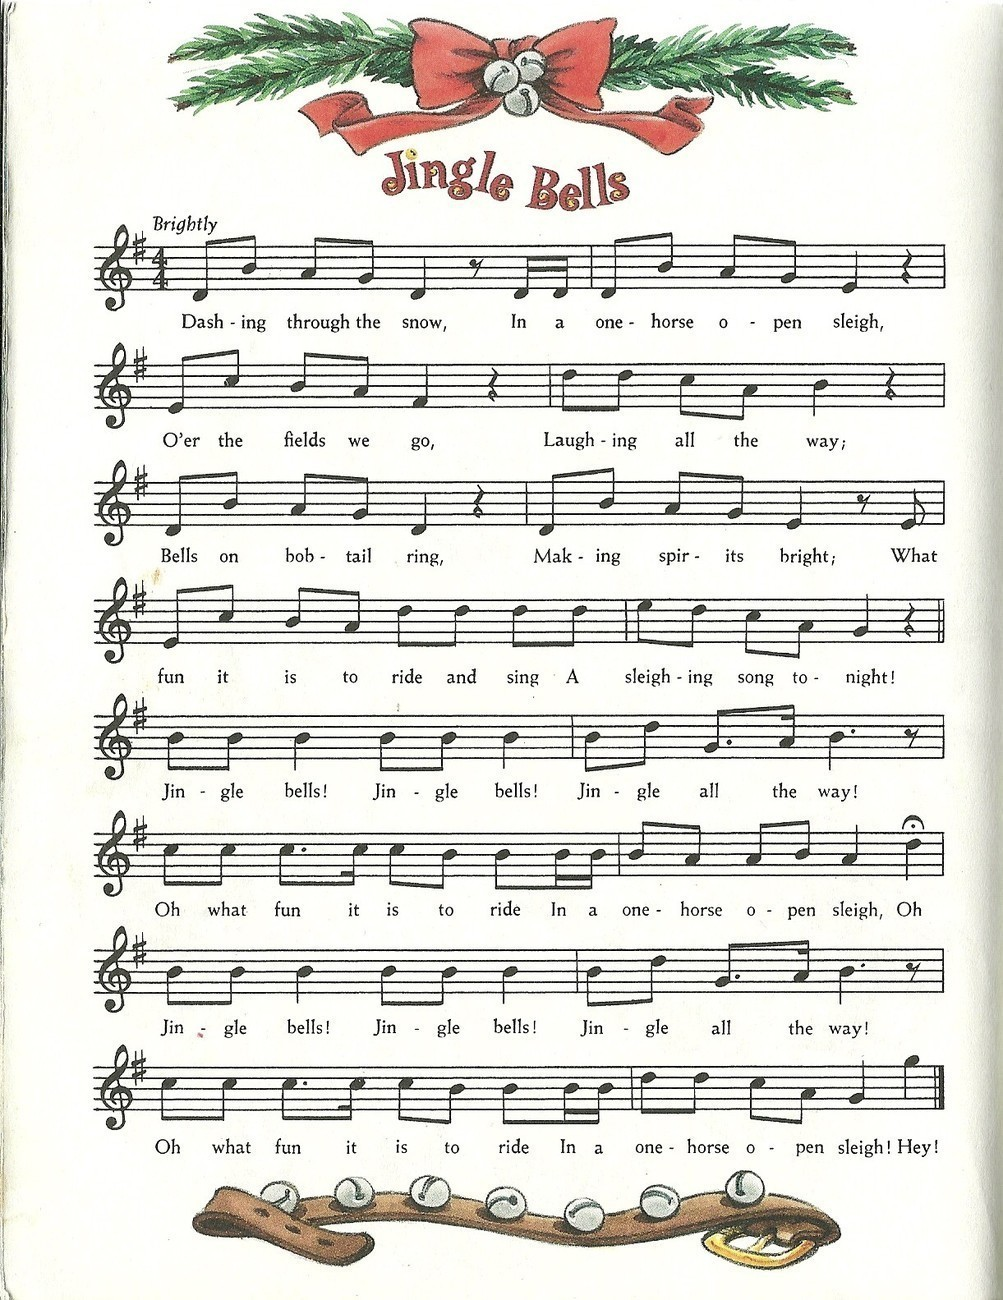 Jingle Bells Diane Muldrow Hardcover Little Golden Book 1st Edition